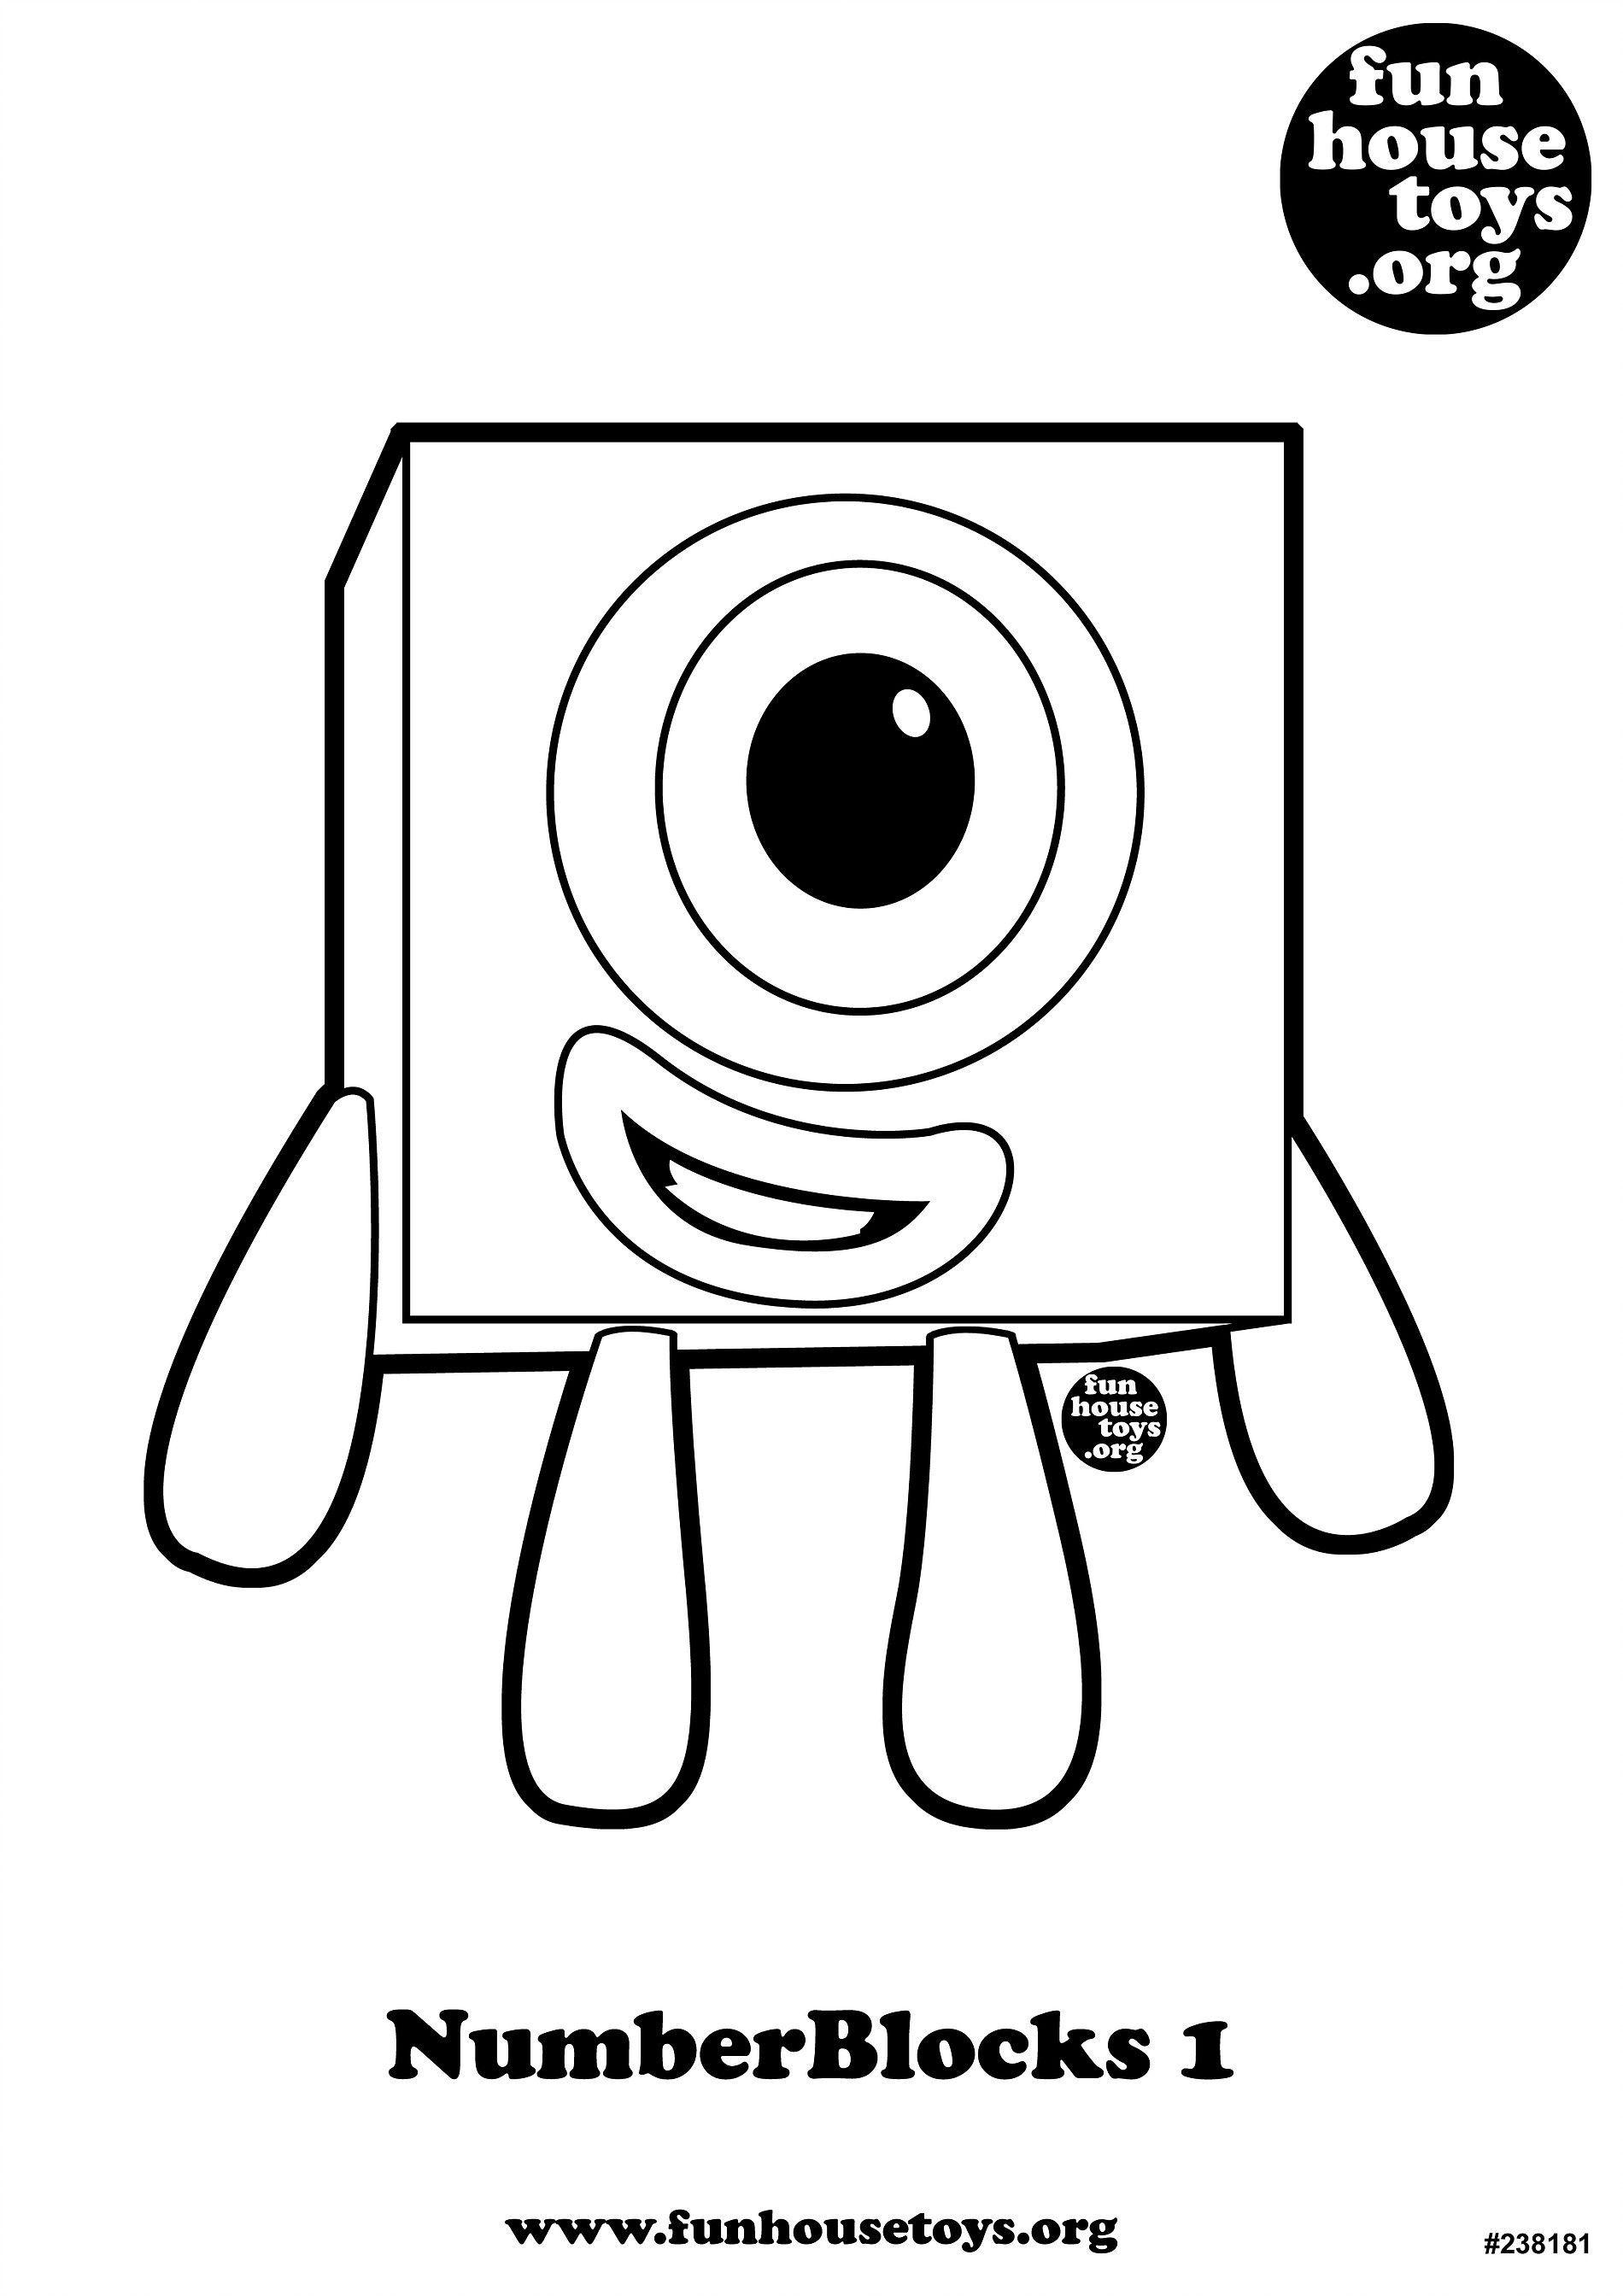 Numberblocks Printables In 2020 Coloring Pages Inspirational Coloring Pages Coloring Sheets For Kids